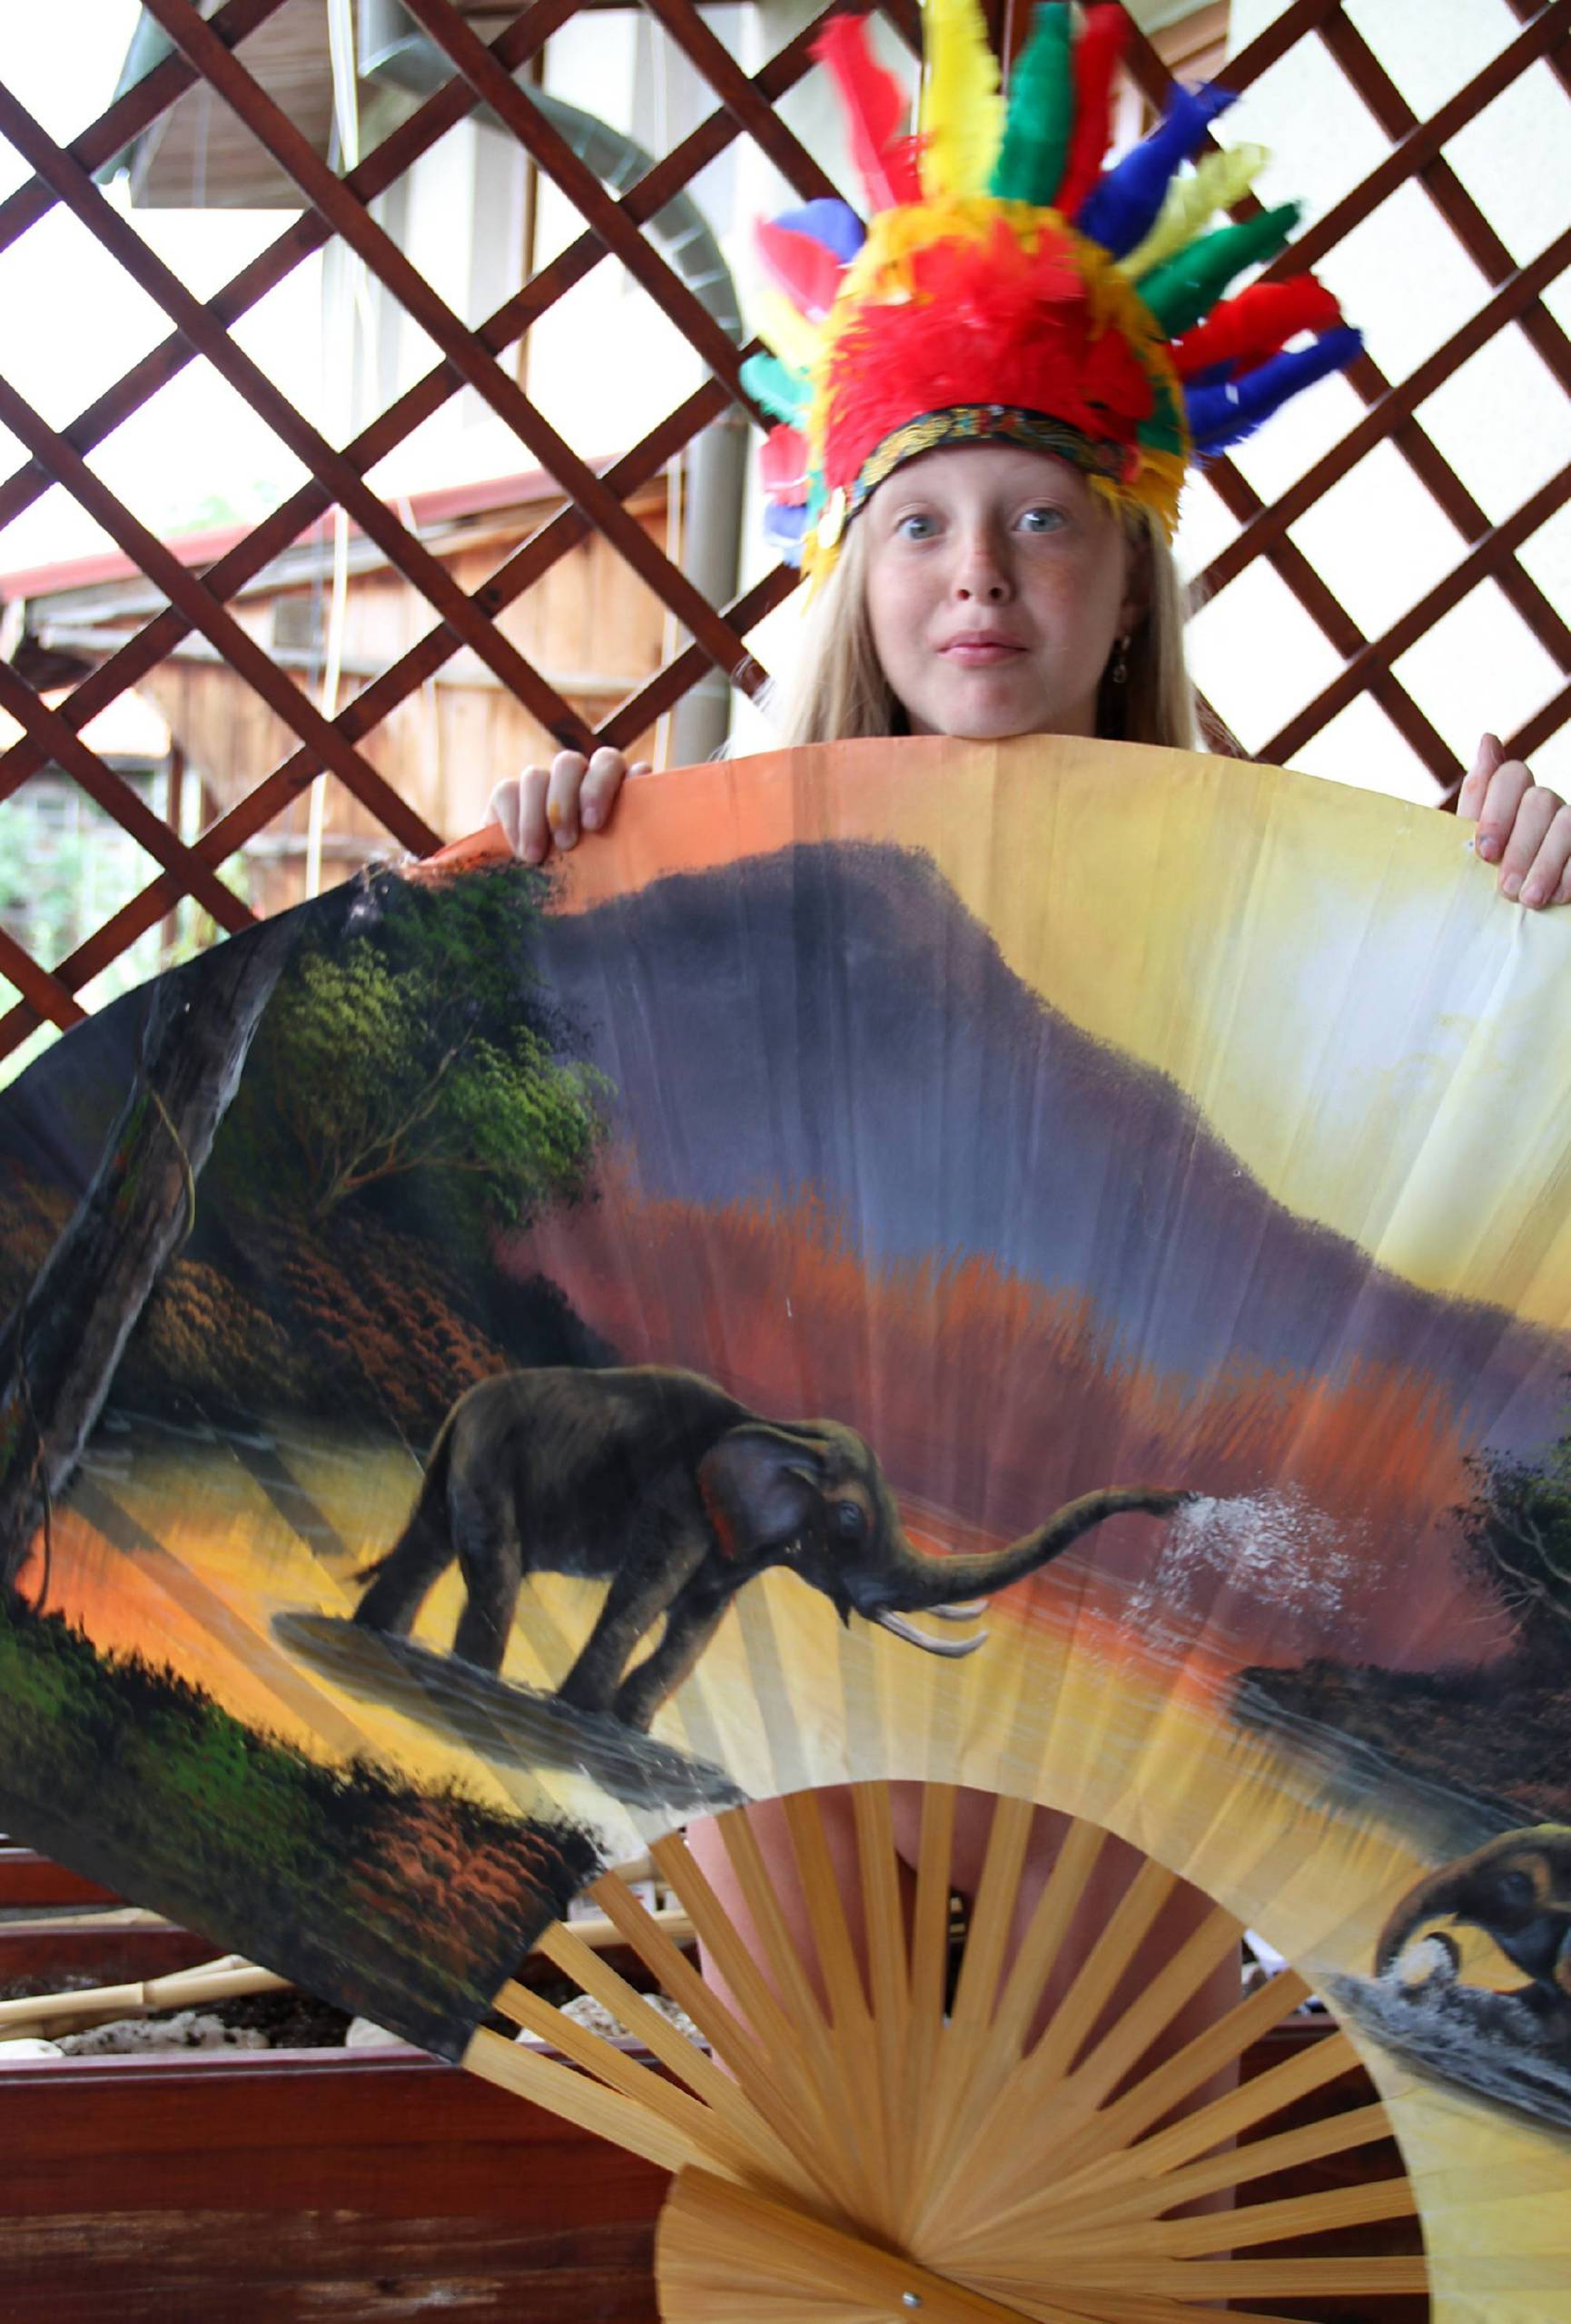 Nudist Pics Indian Summer Painting - 1